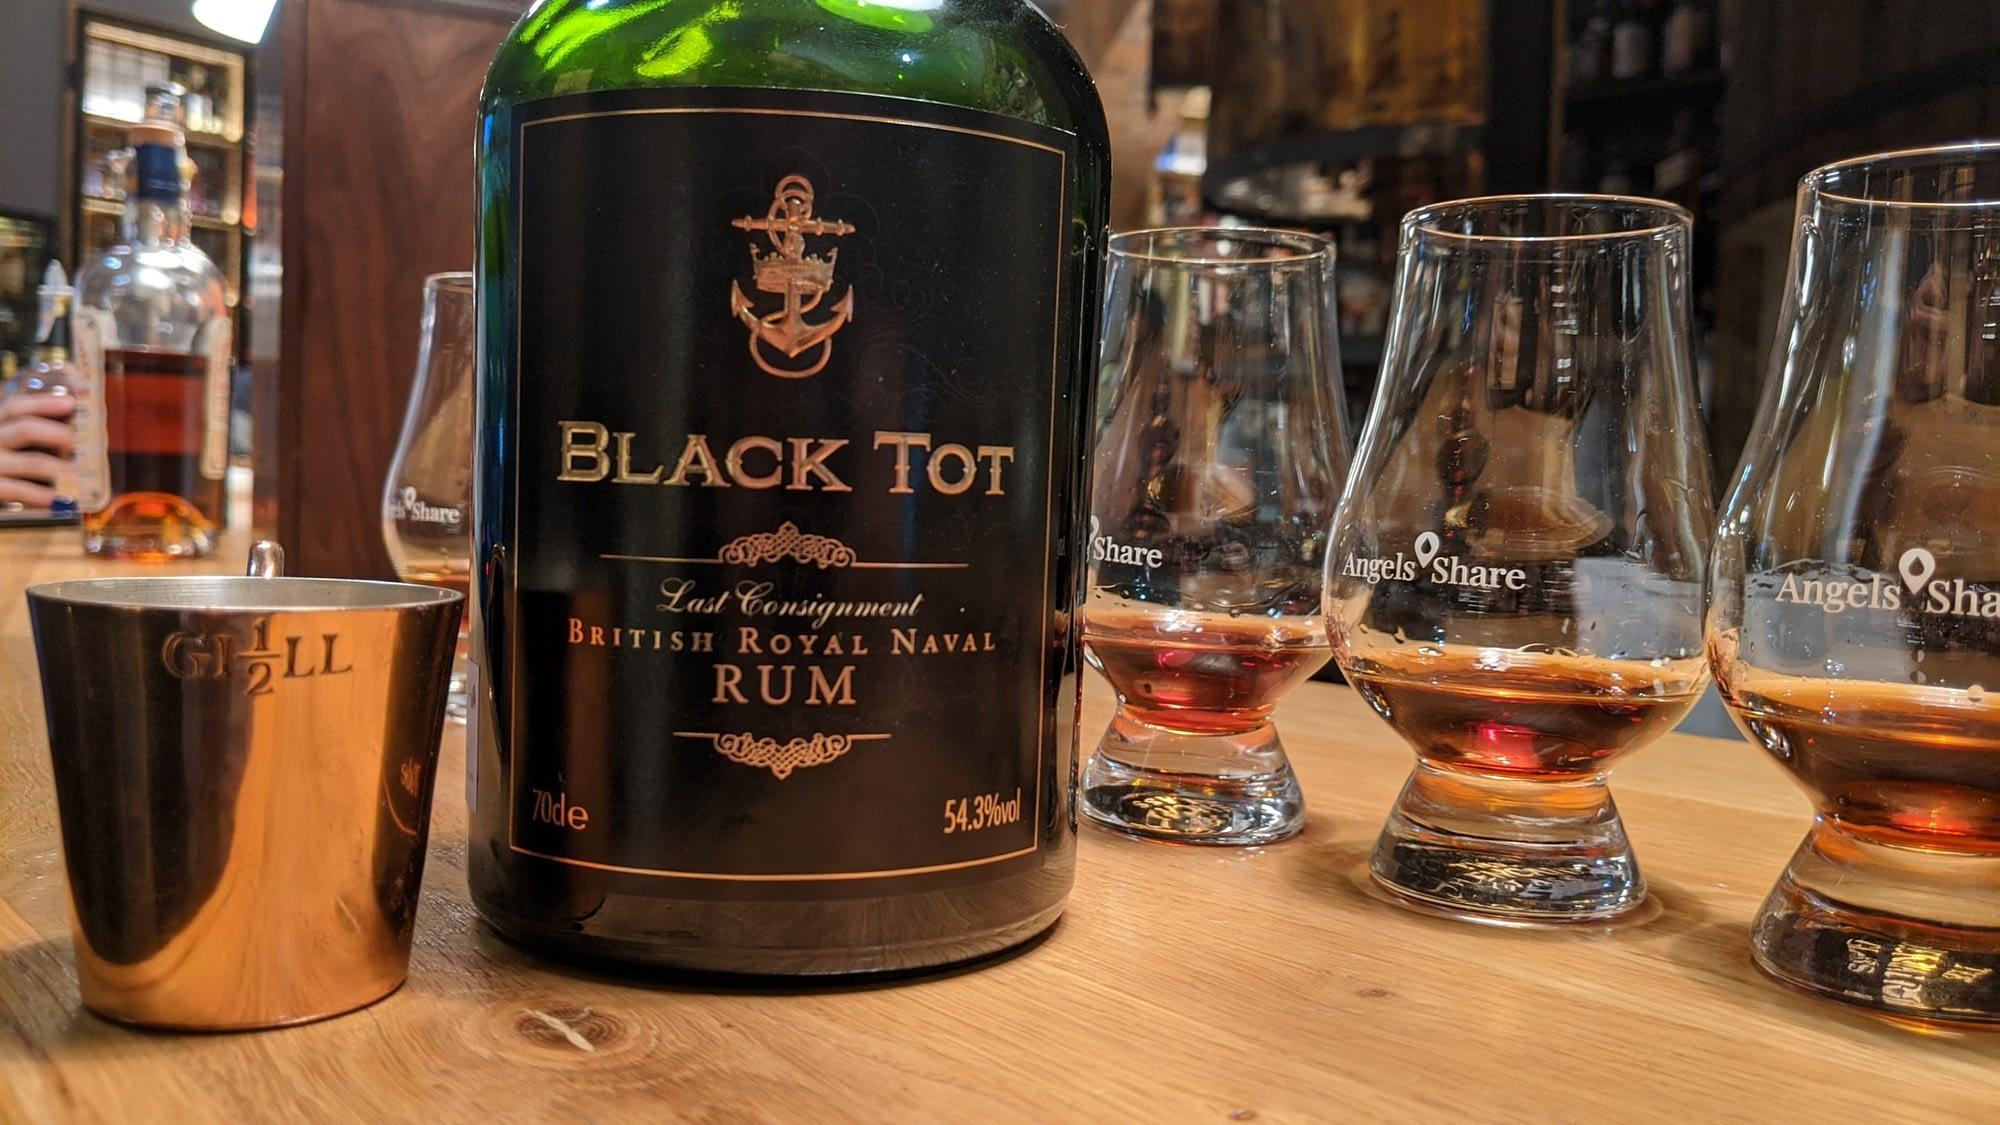 Black Tot Last Consignment tasting